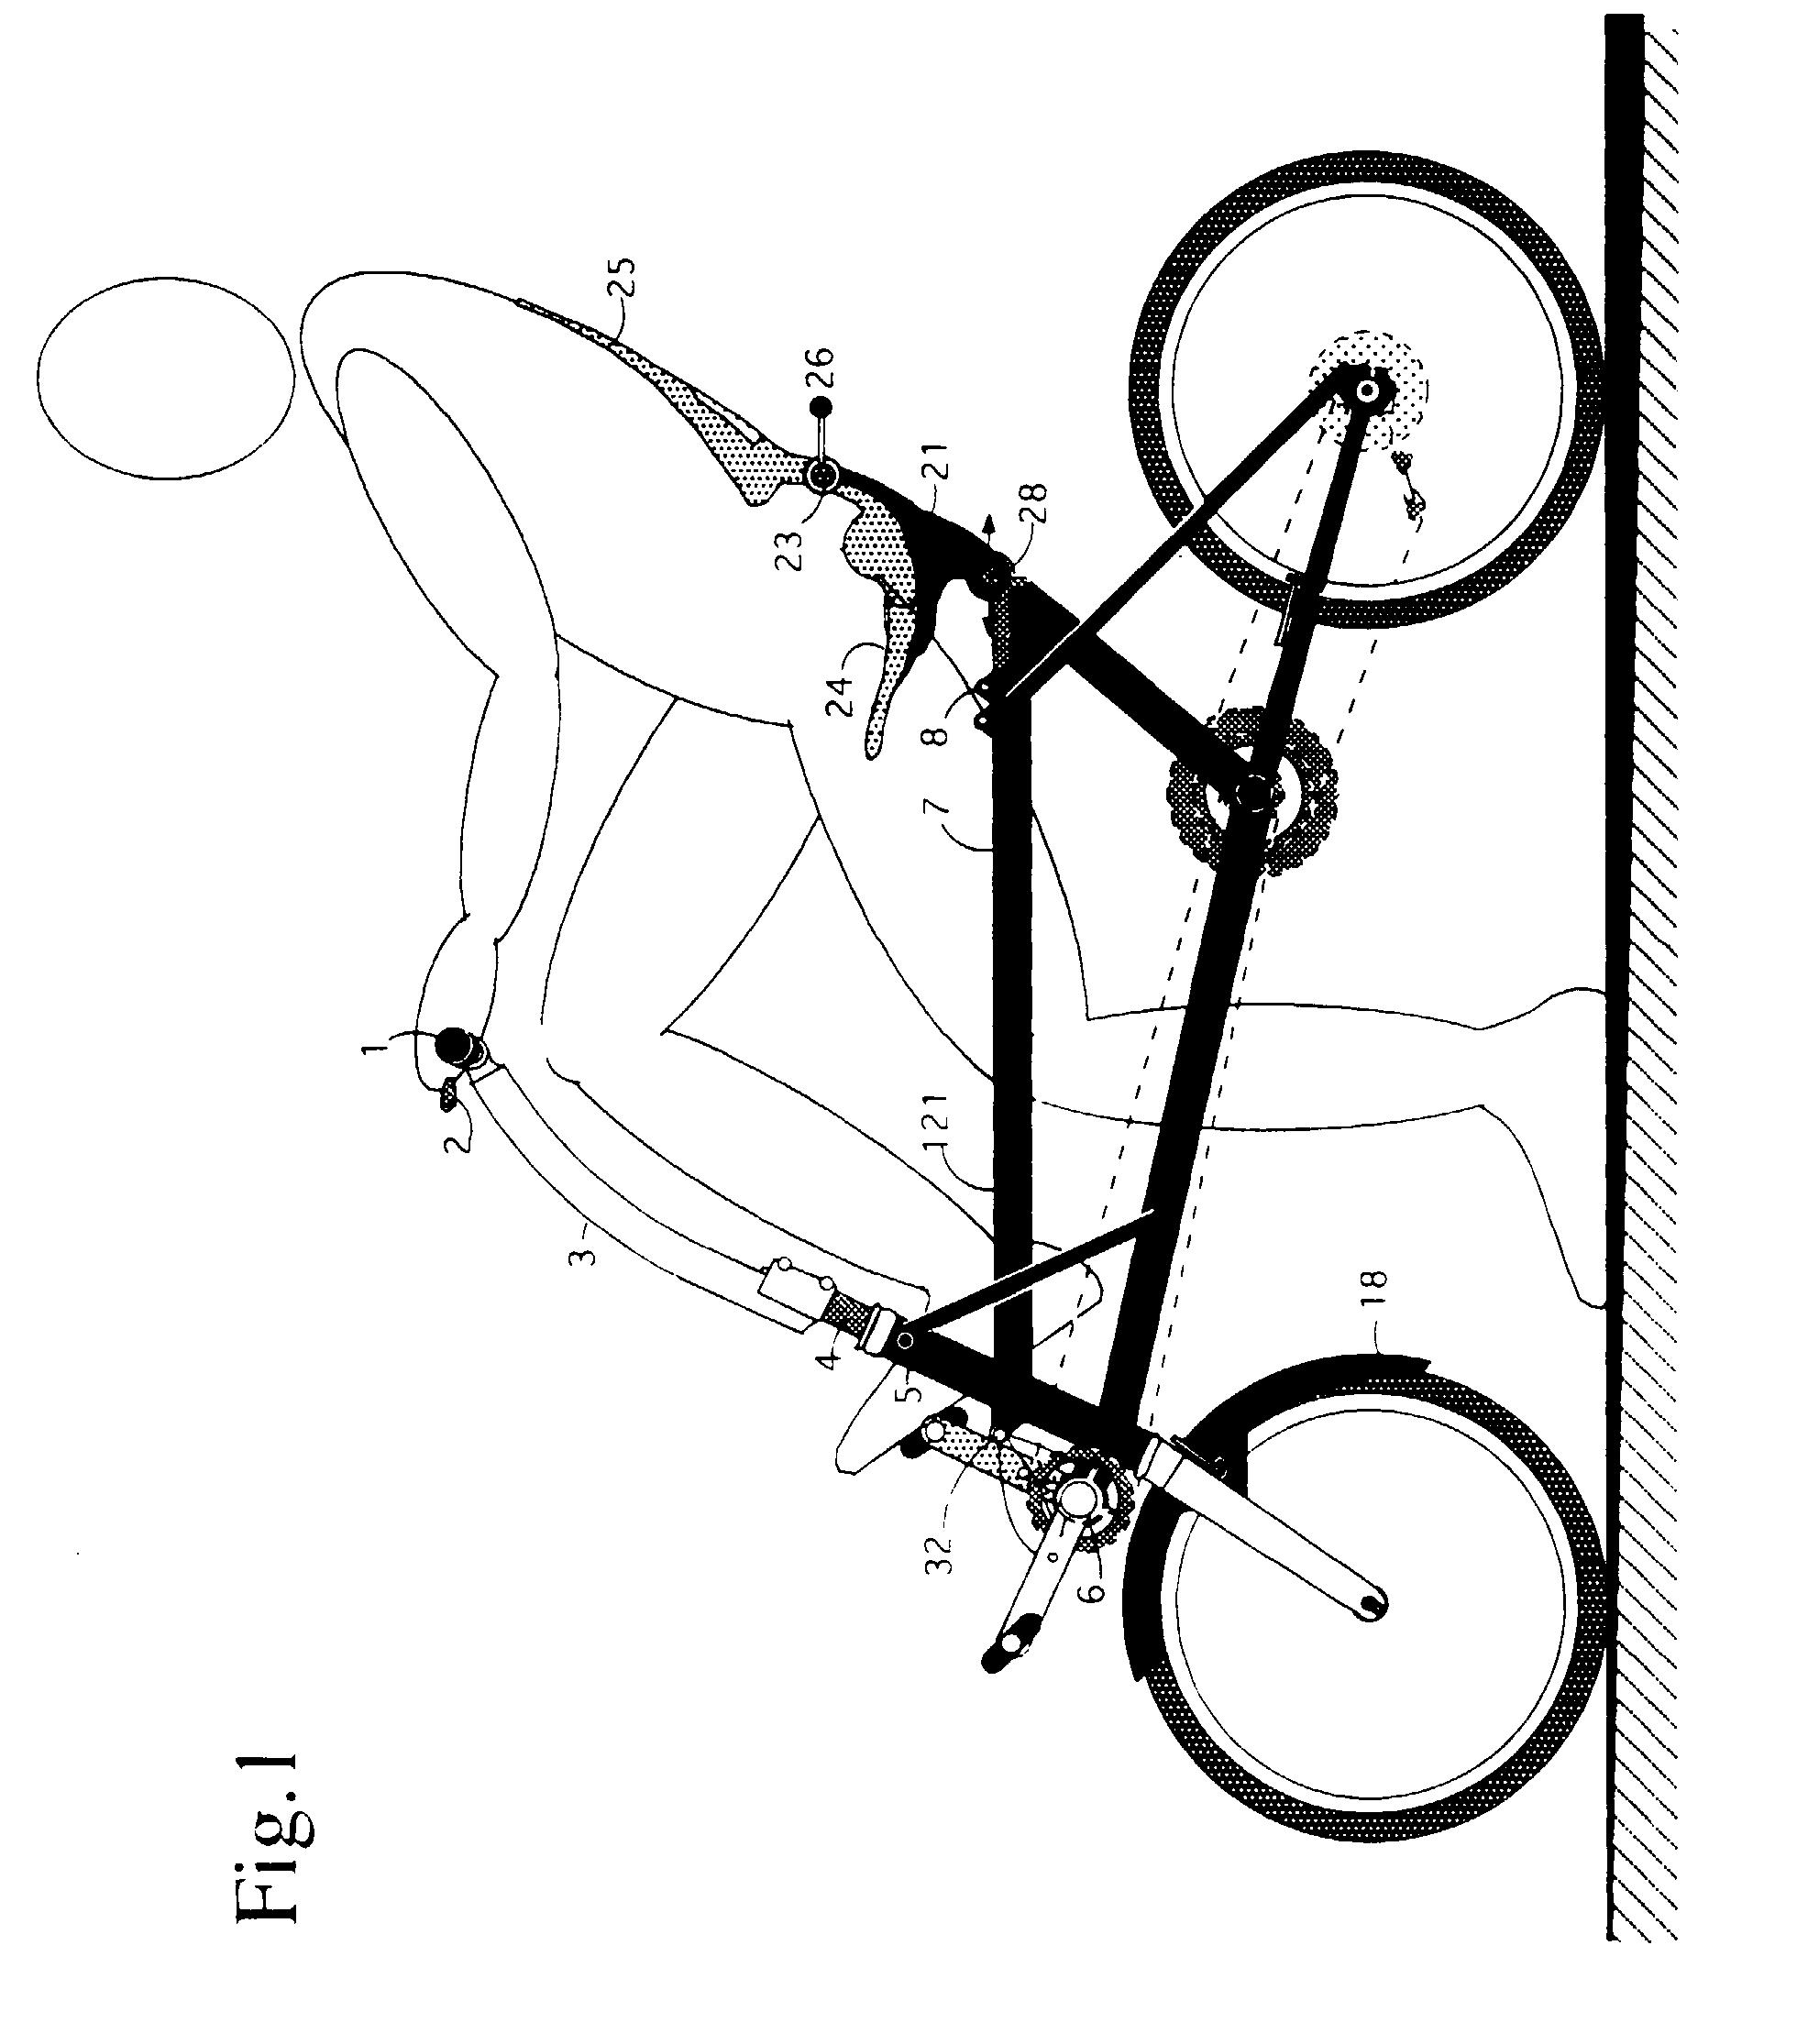 06 flhr handlebars wiring diagram